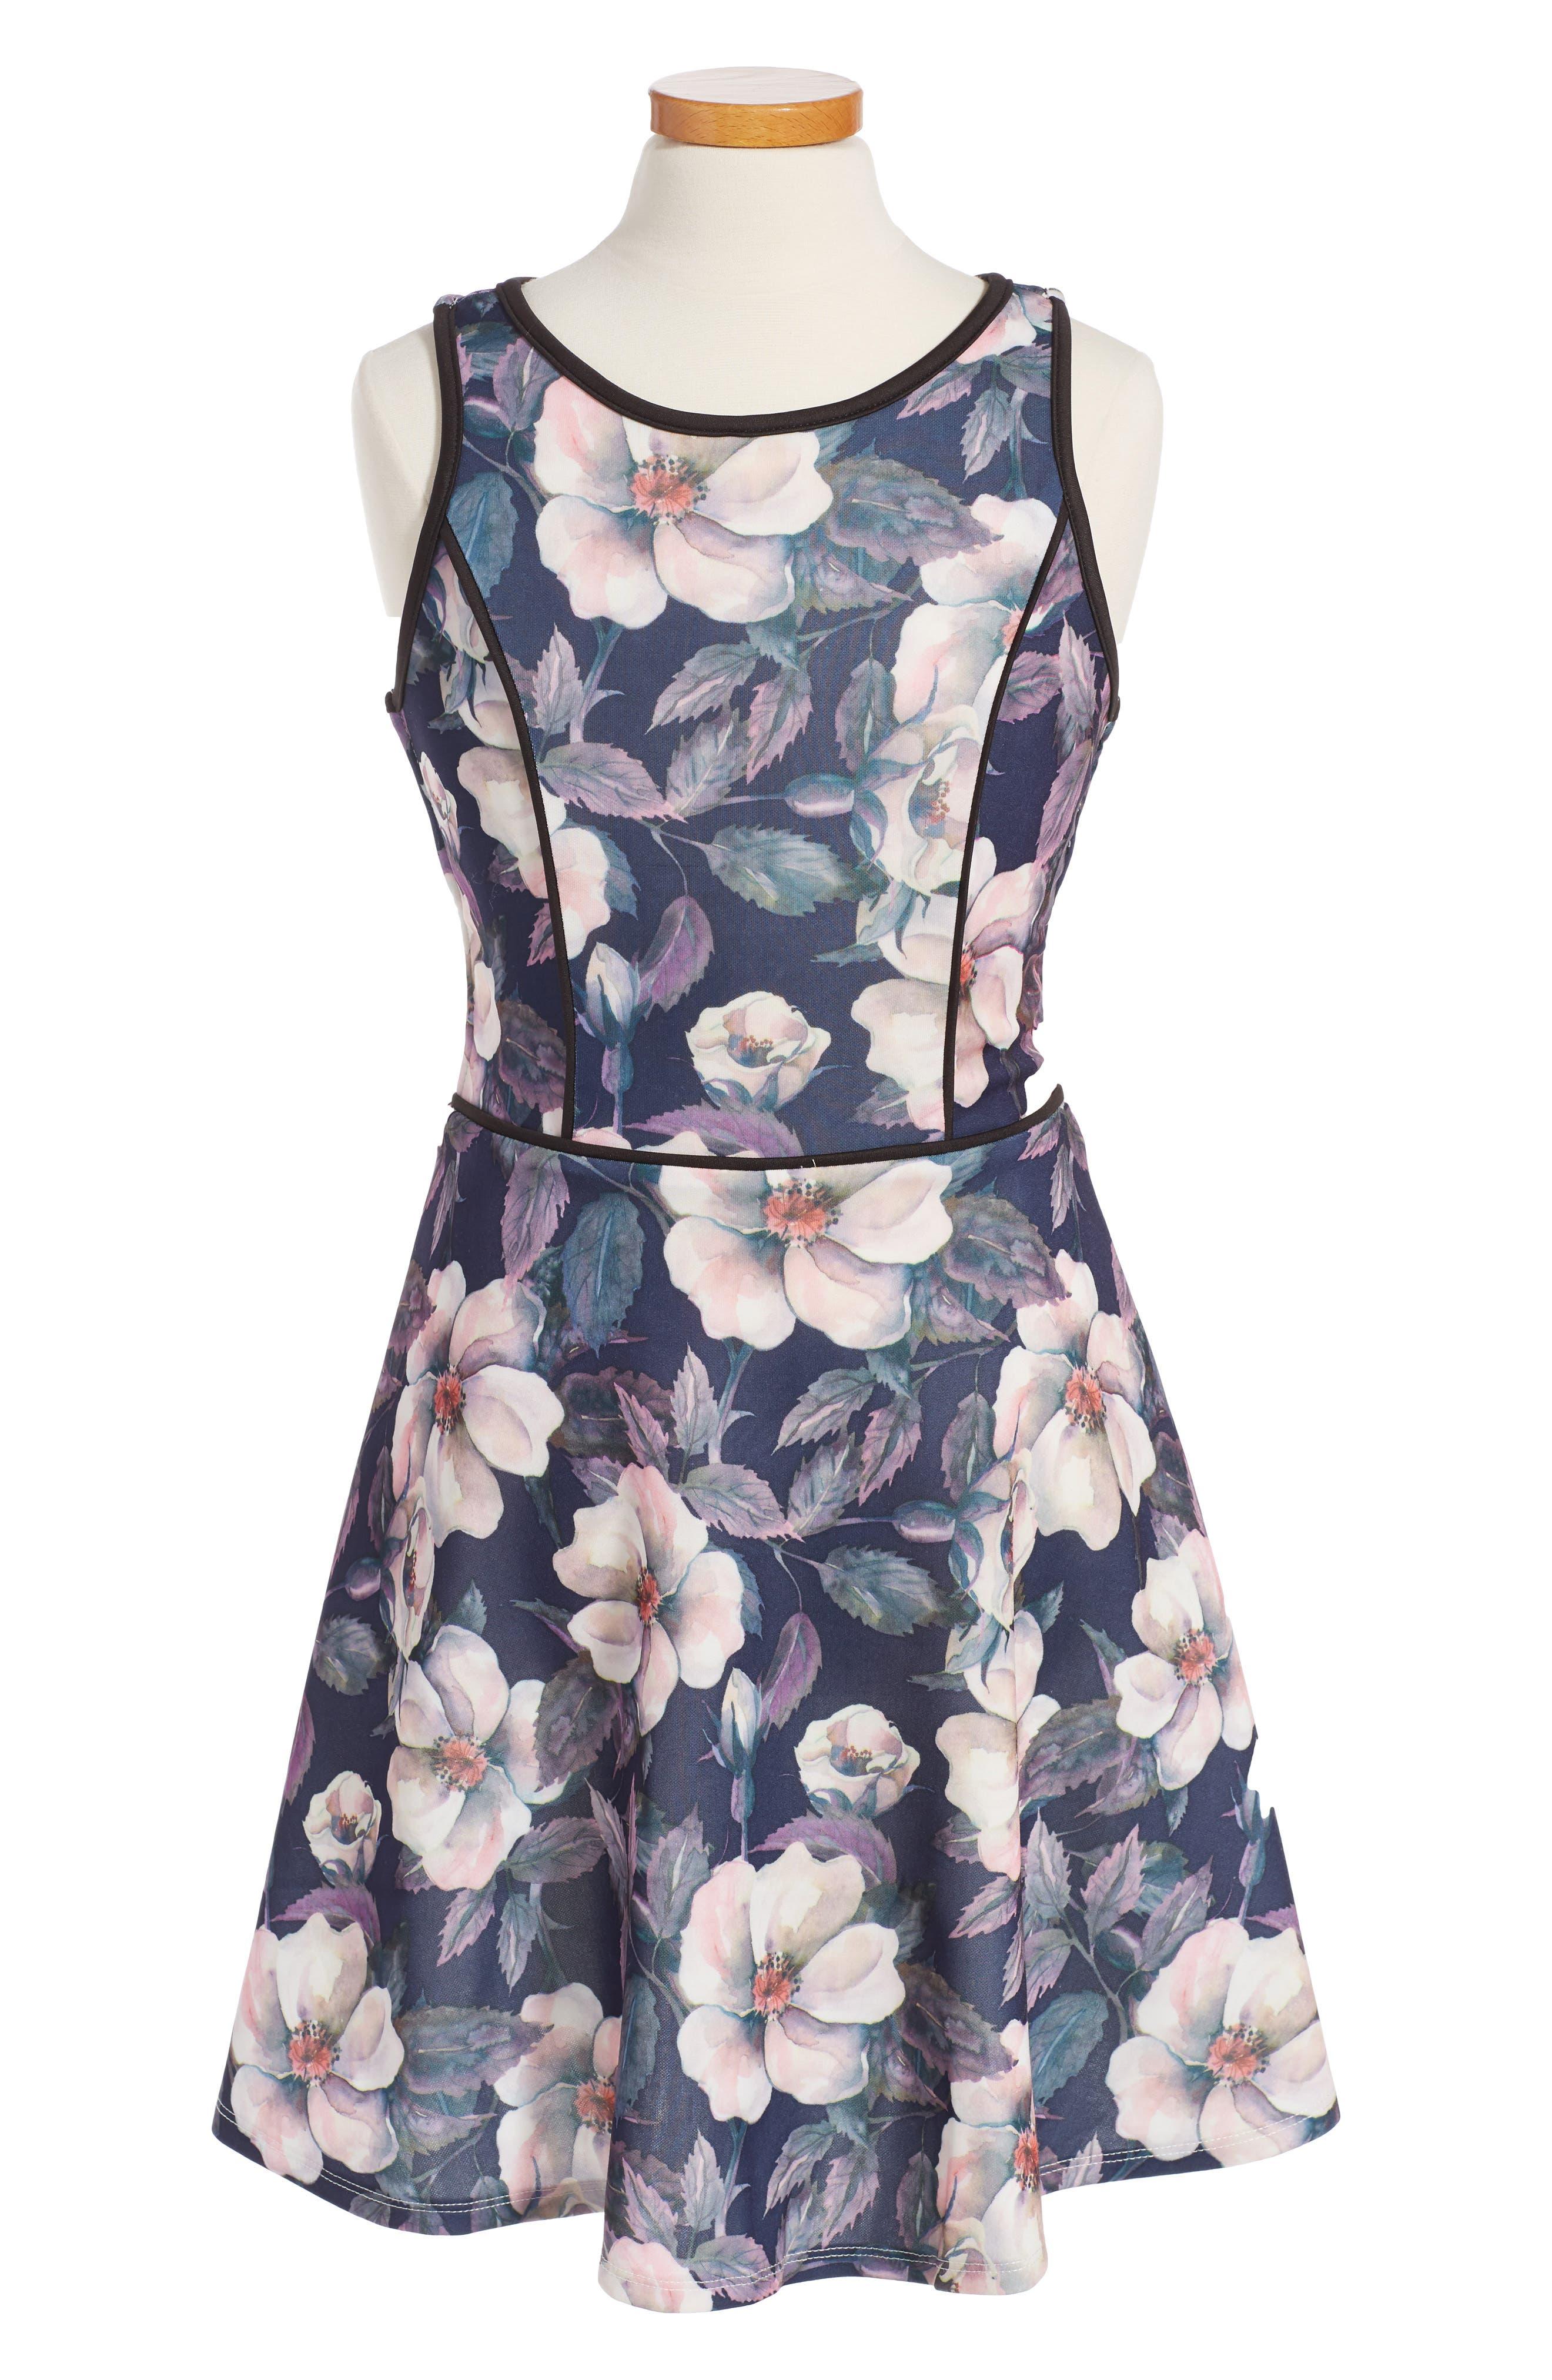 PENELOPE TREE Floral Print Sleeveless Dress